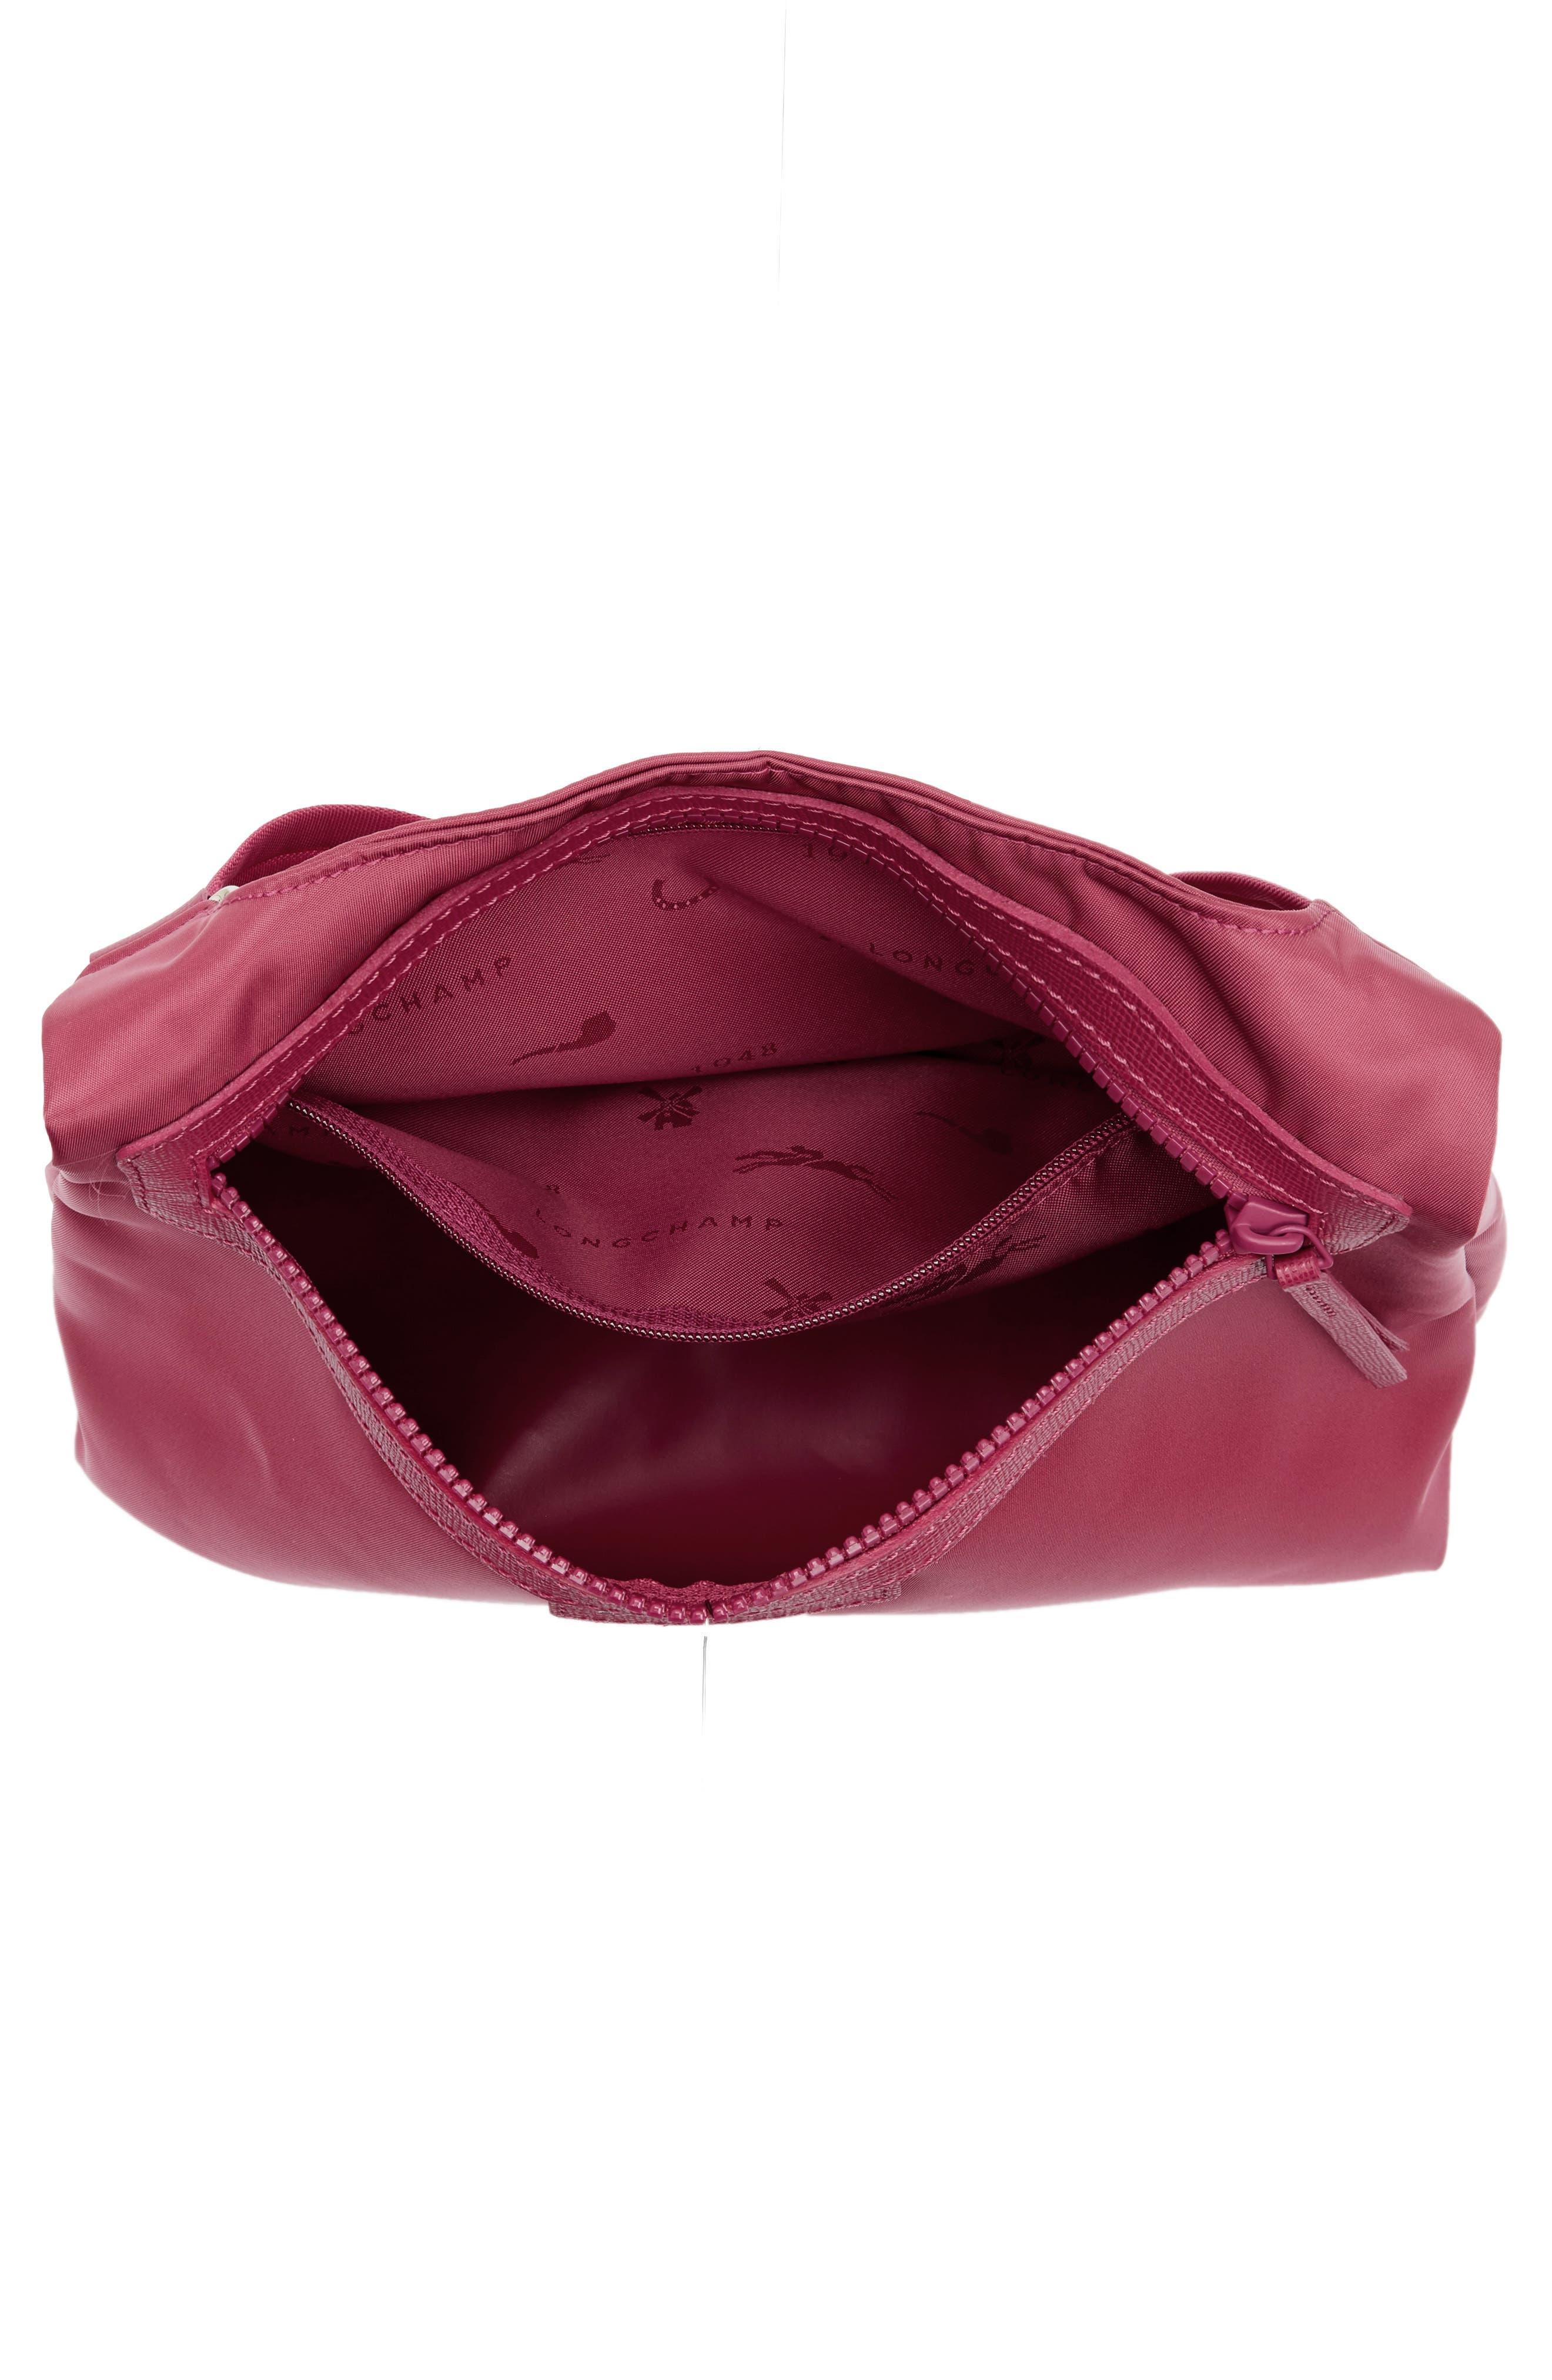 Le Pliage Neo Nylon Crossbody Bag,                             Alternate thumbnail 4, color,                             650